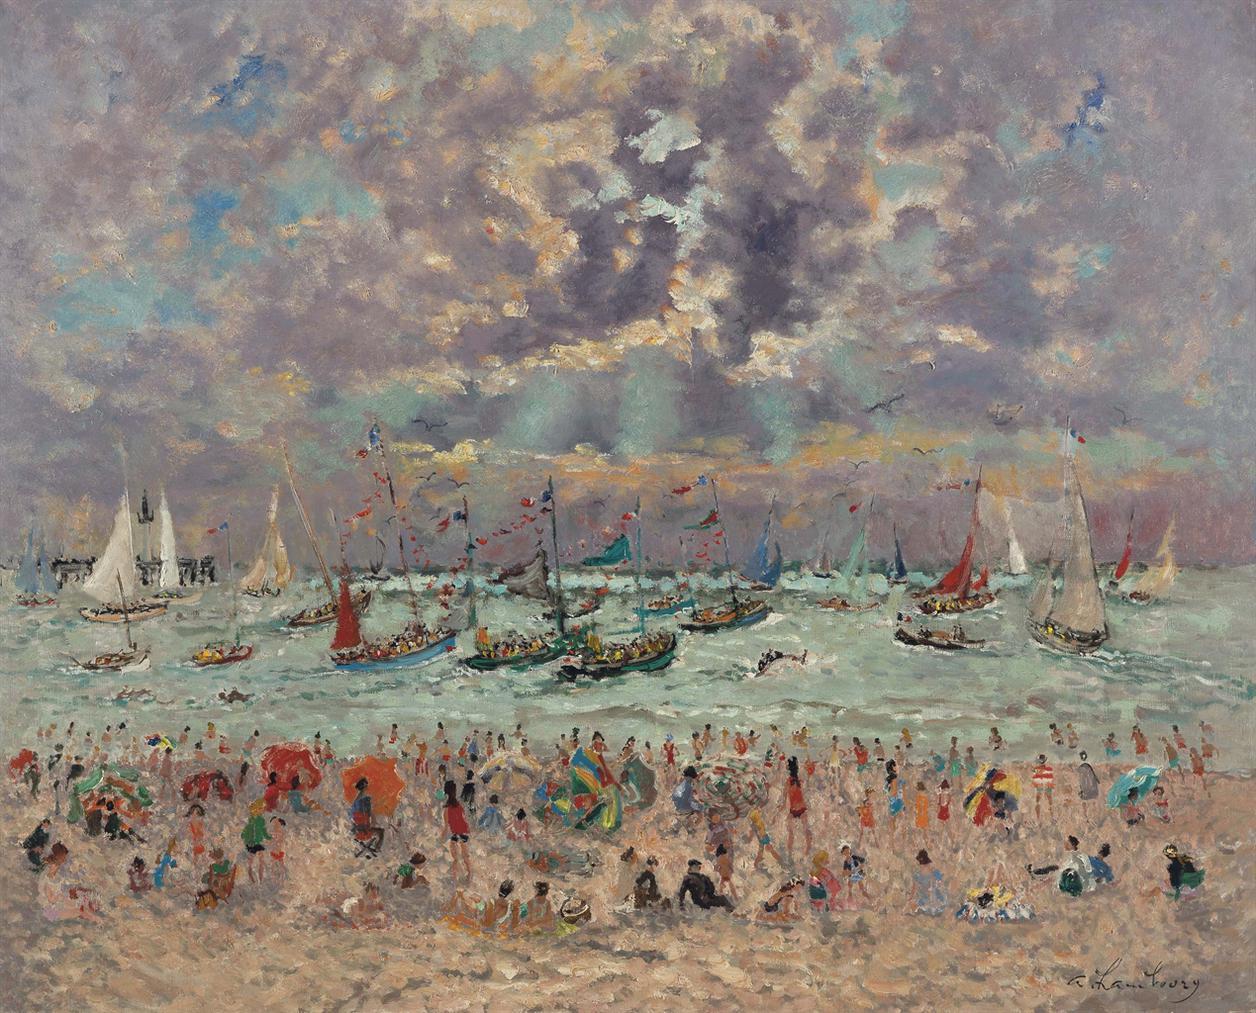 Andre Hambourg-La Fete De La Mer-1966